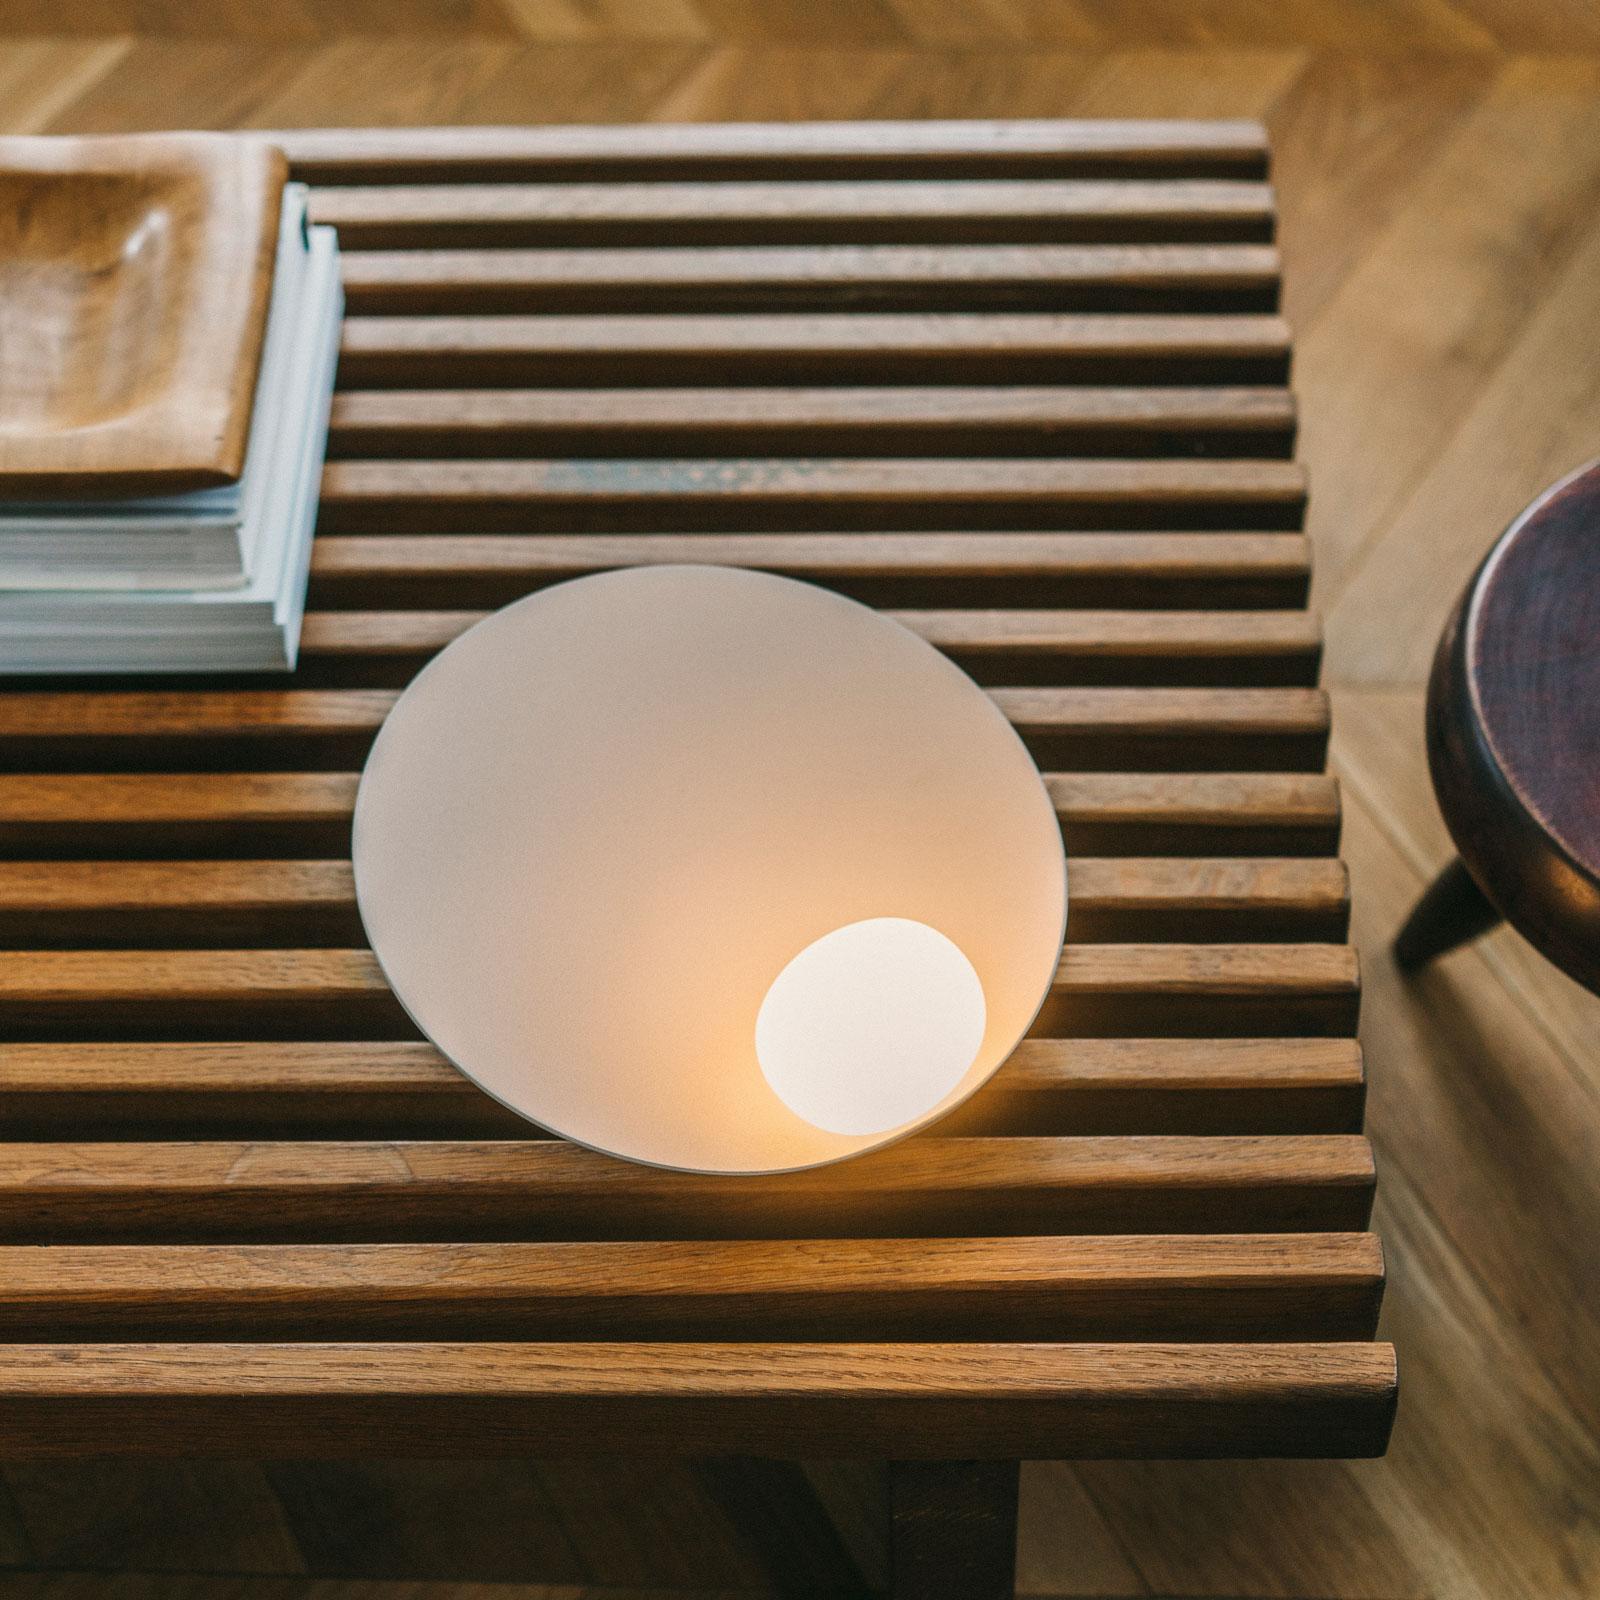 Vibia Musa 7402 LED-pöytälamppu vaaka, kyyhky